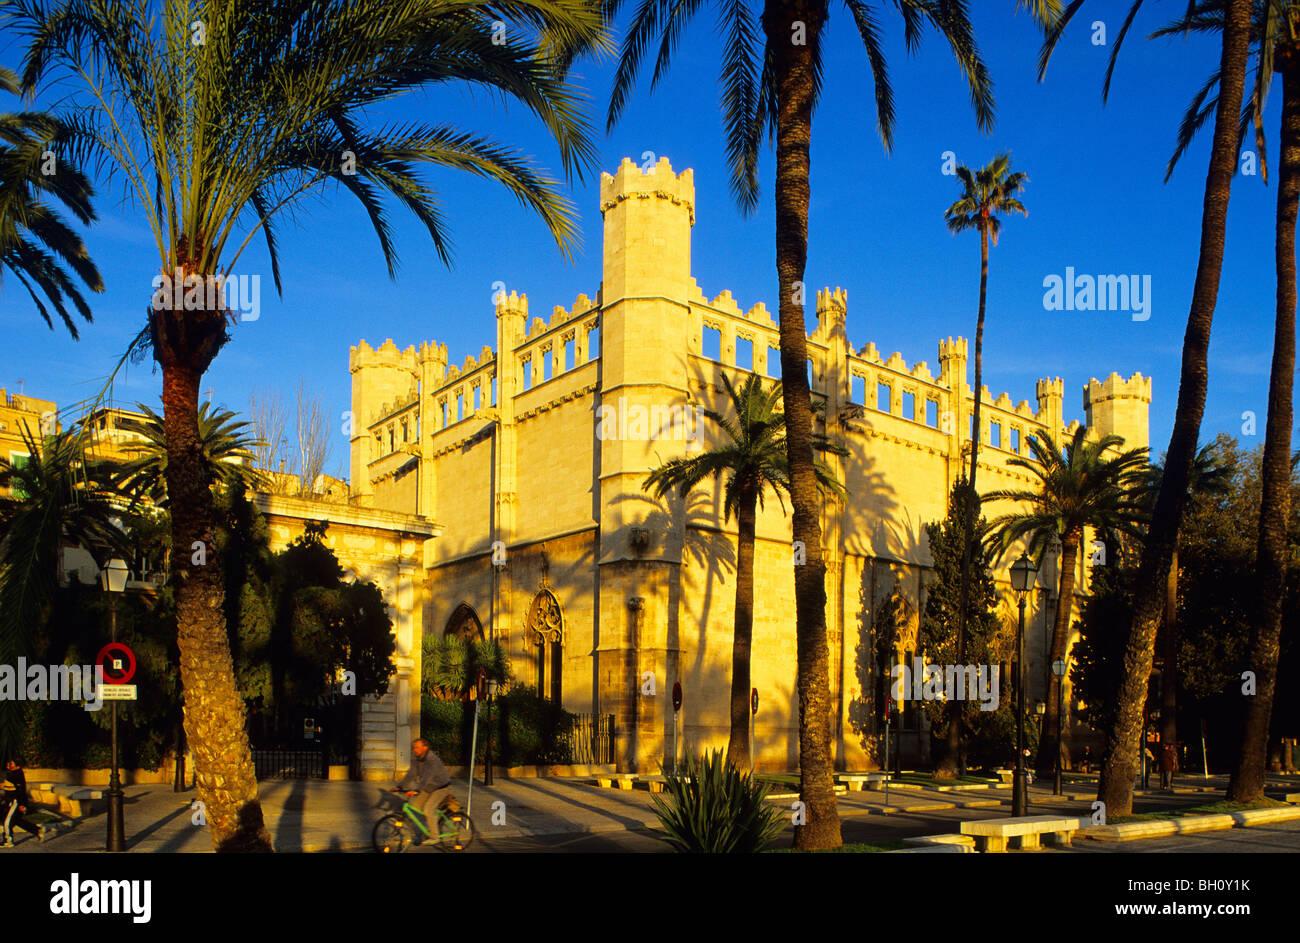 Europe, Spain, Majorca, Palma, Sa Llotja, stock exchange - Stock Image